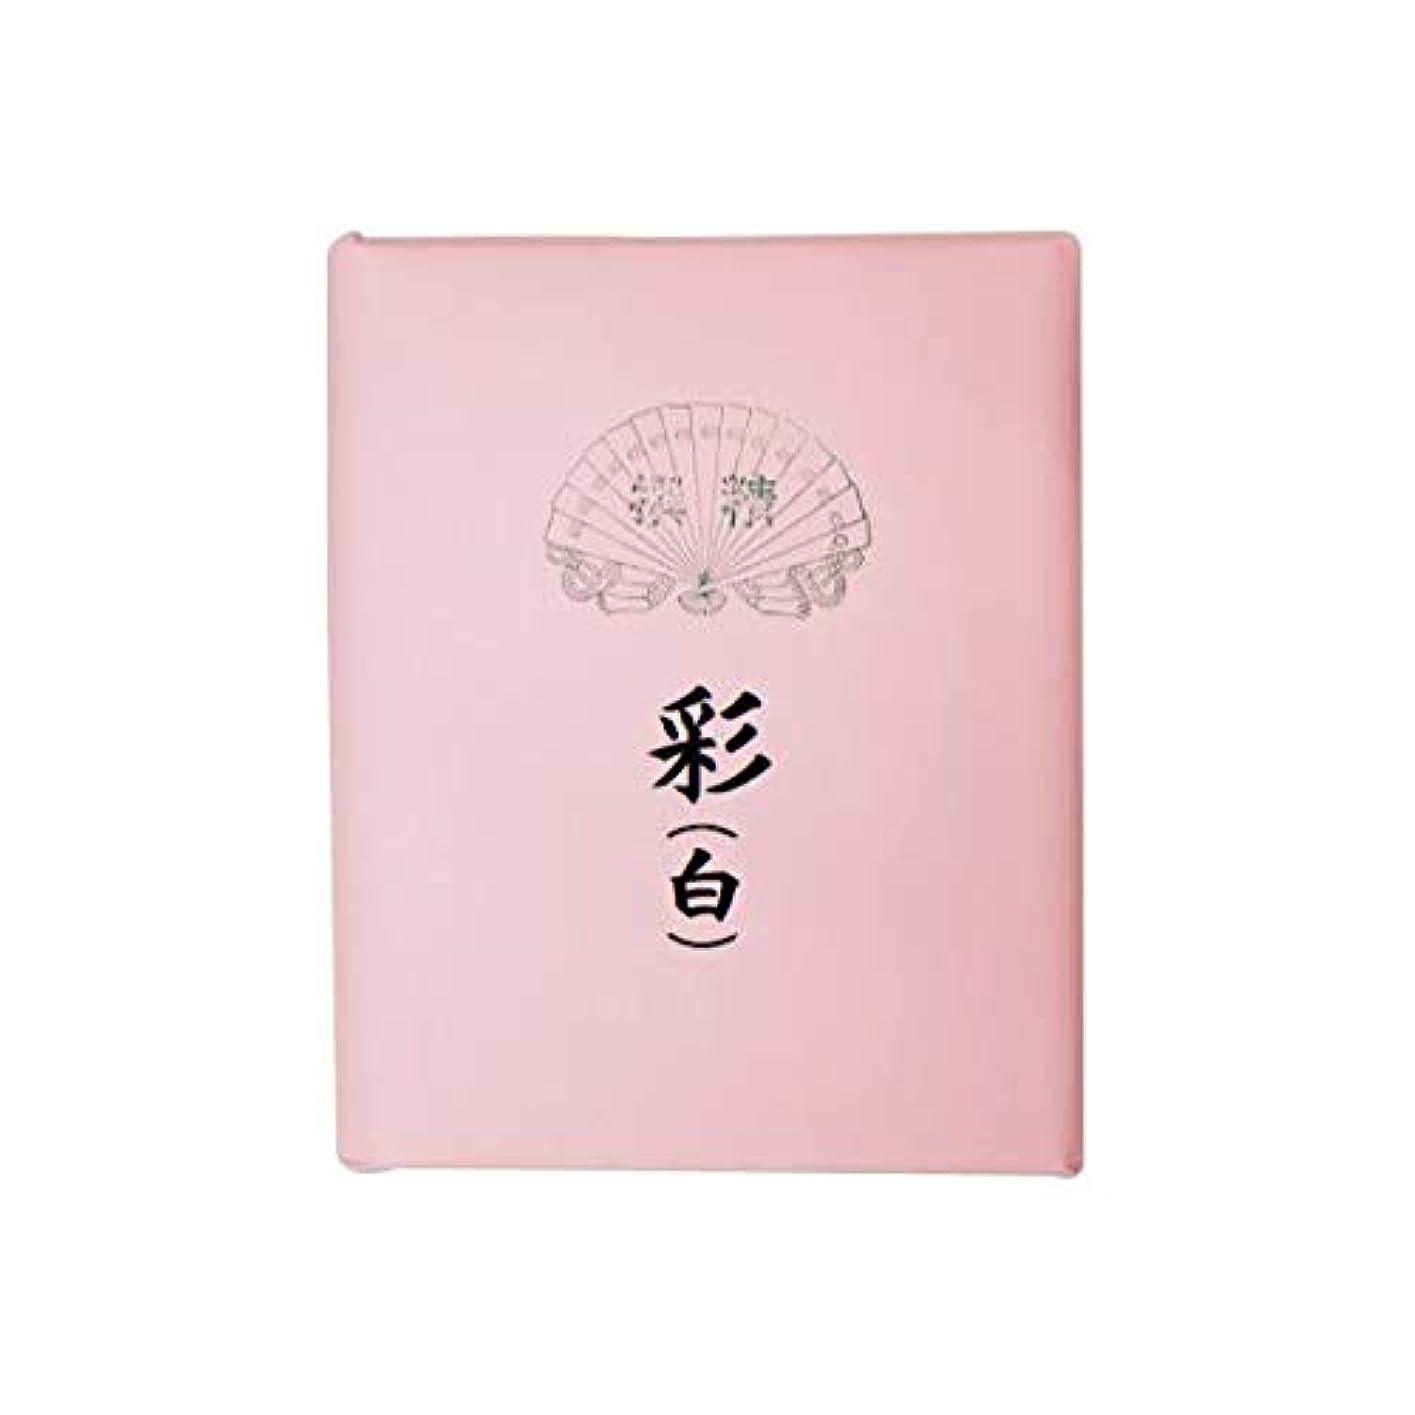 ダーツ姪魔術師仮名用加工紙 彩 白?506ZA-2